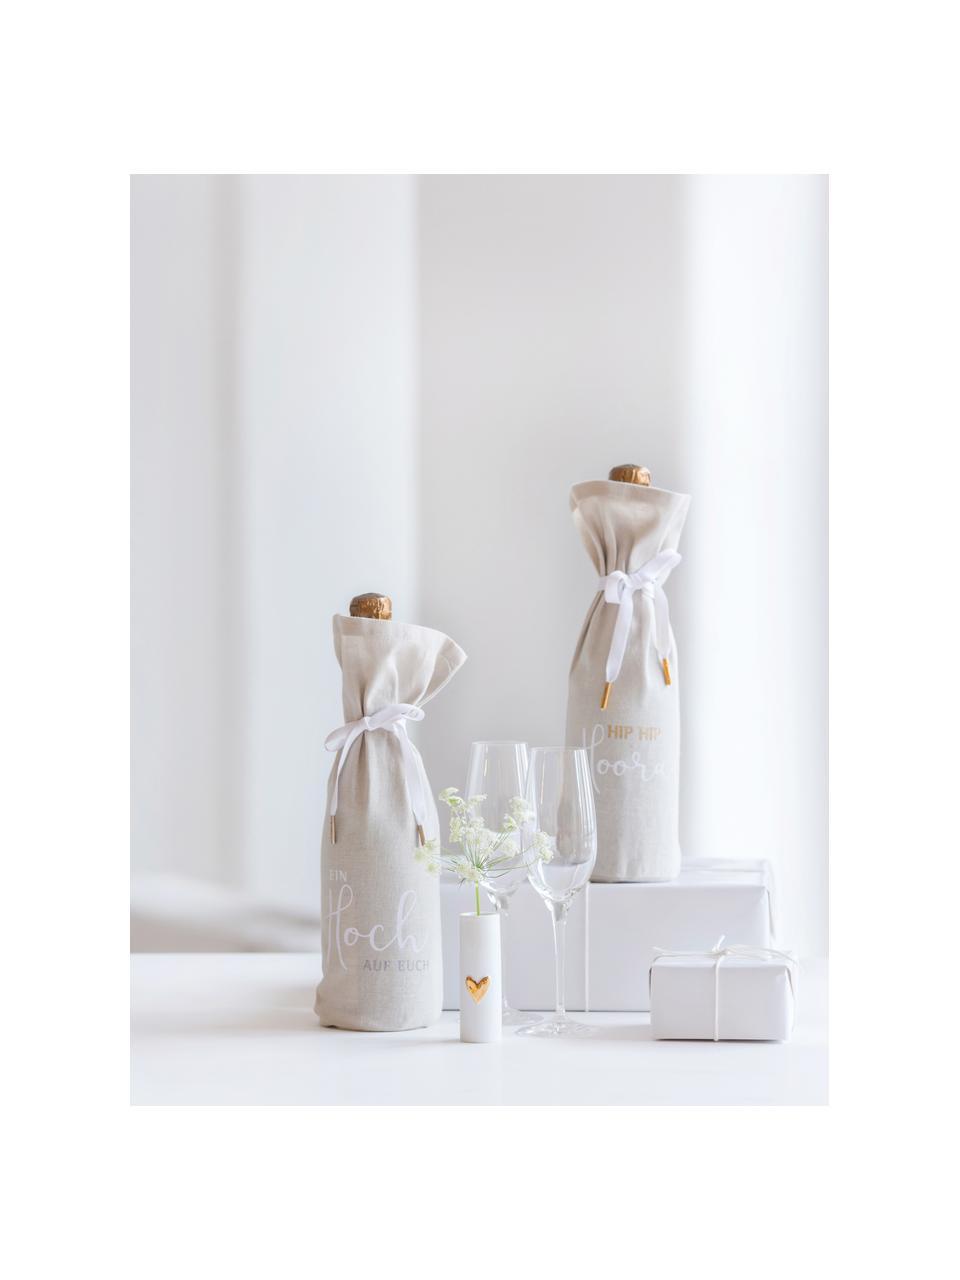 XS Porzellan-Vase Heart, 2 Stück, Porzellan, Weiß, Goldfarben, Ø 3 x H 9 cm